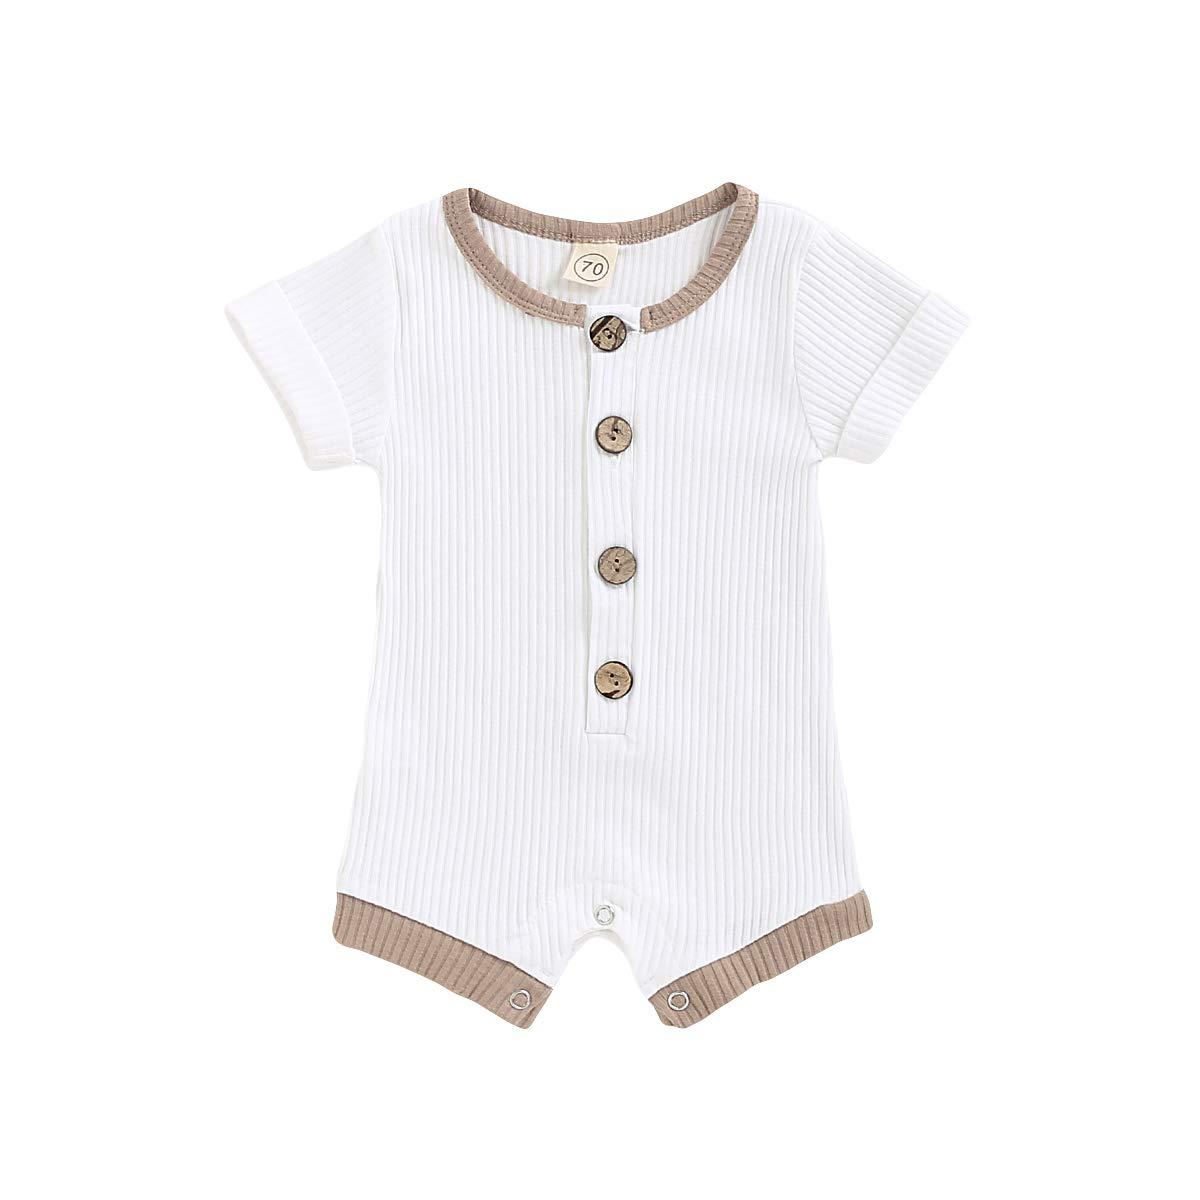 Newborn Baby Clothes Pure Cotton Romper One-Piece Jumpsuits Shorts Set Bodysuit Casual Outfit